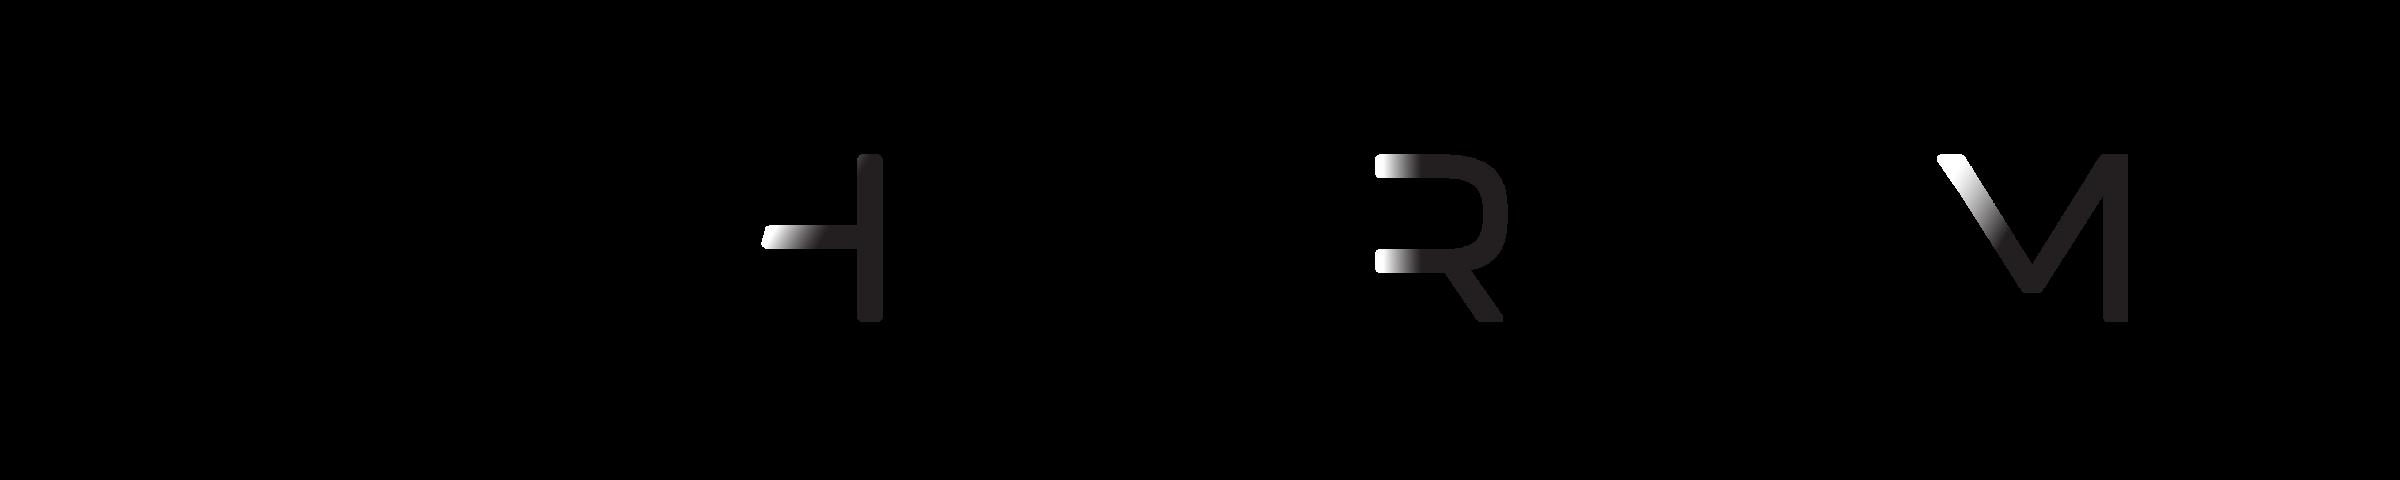 Whiteroom Logo Black